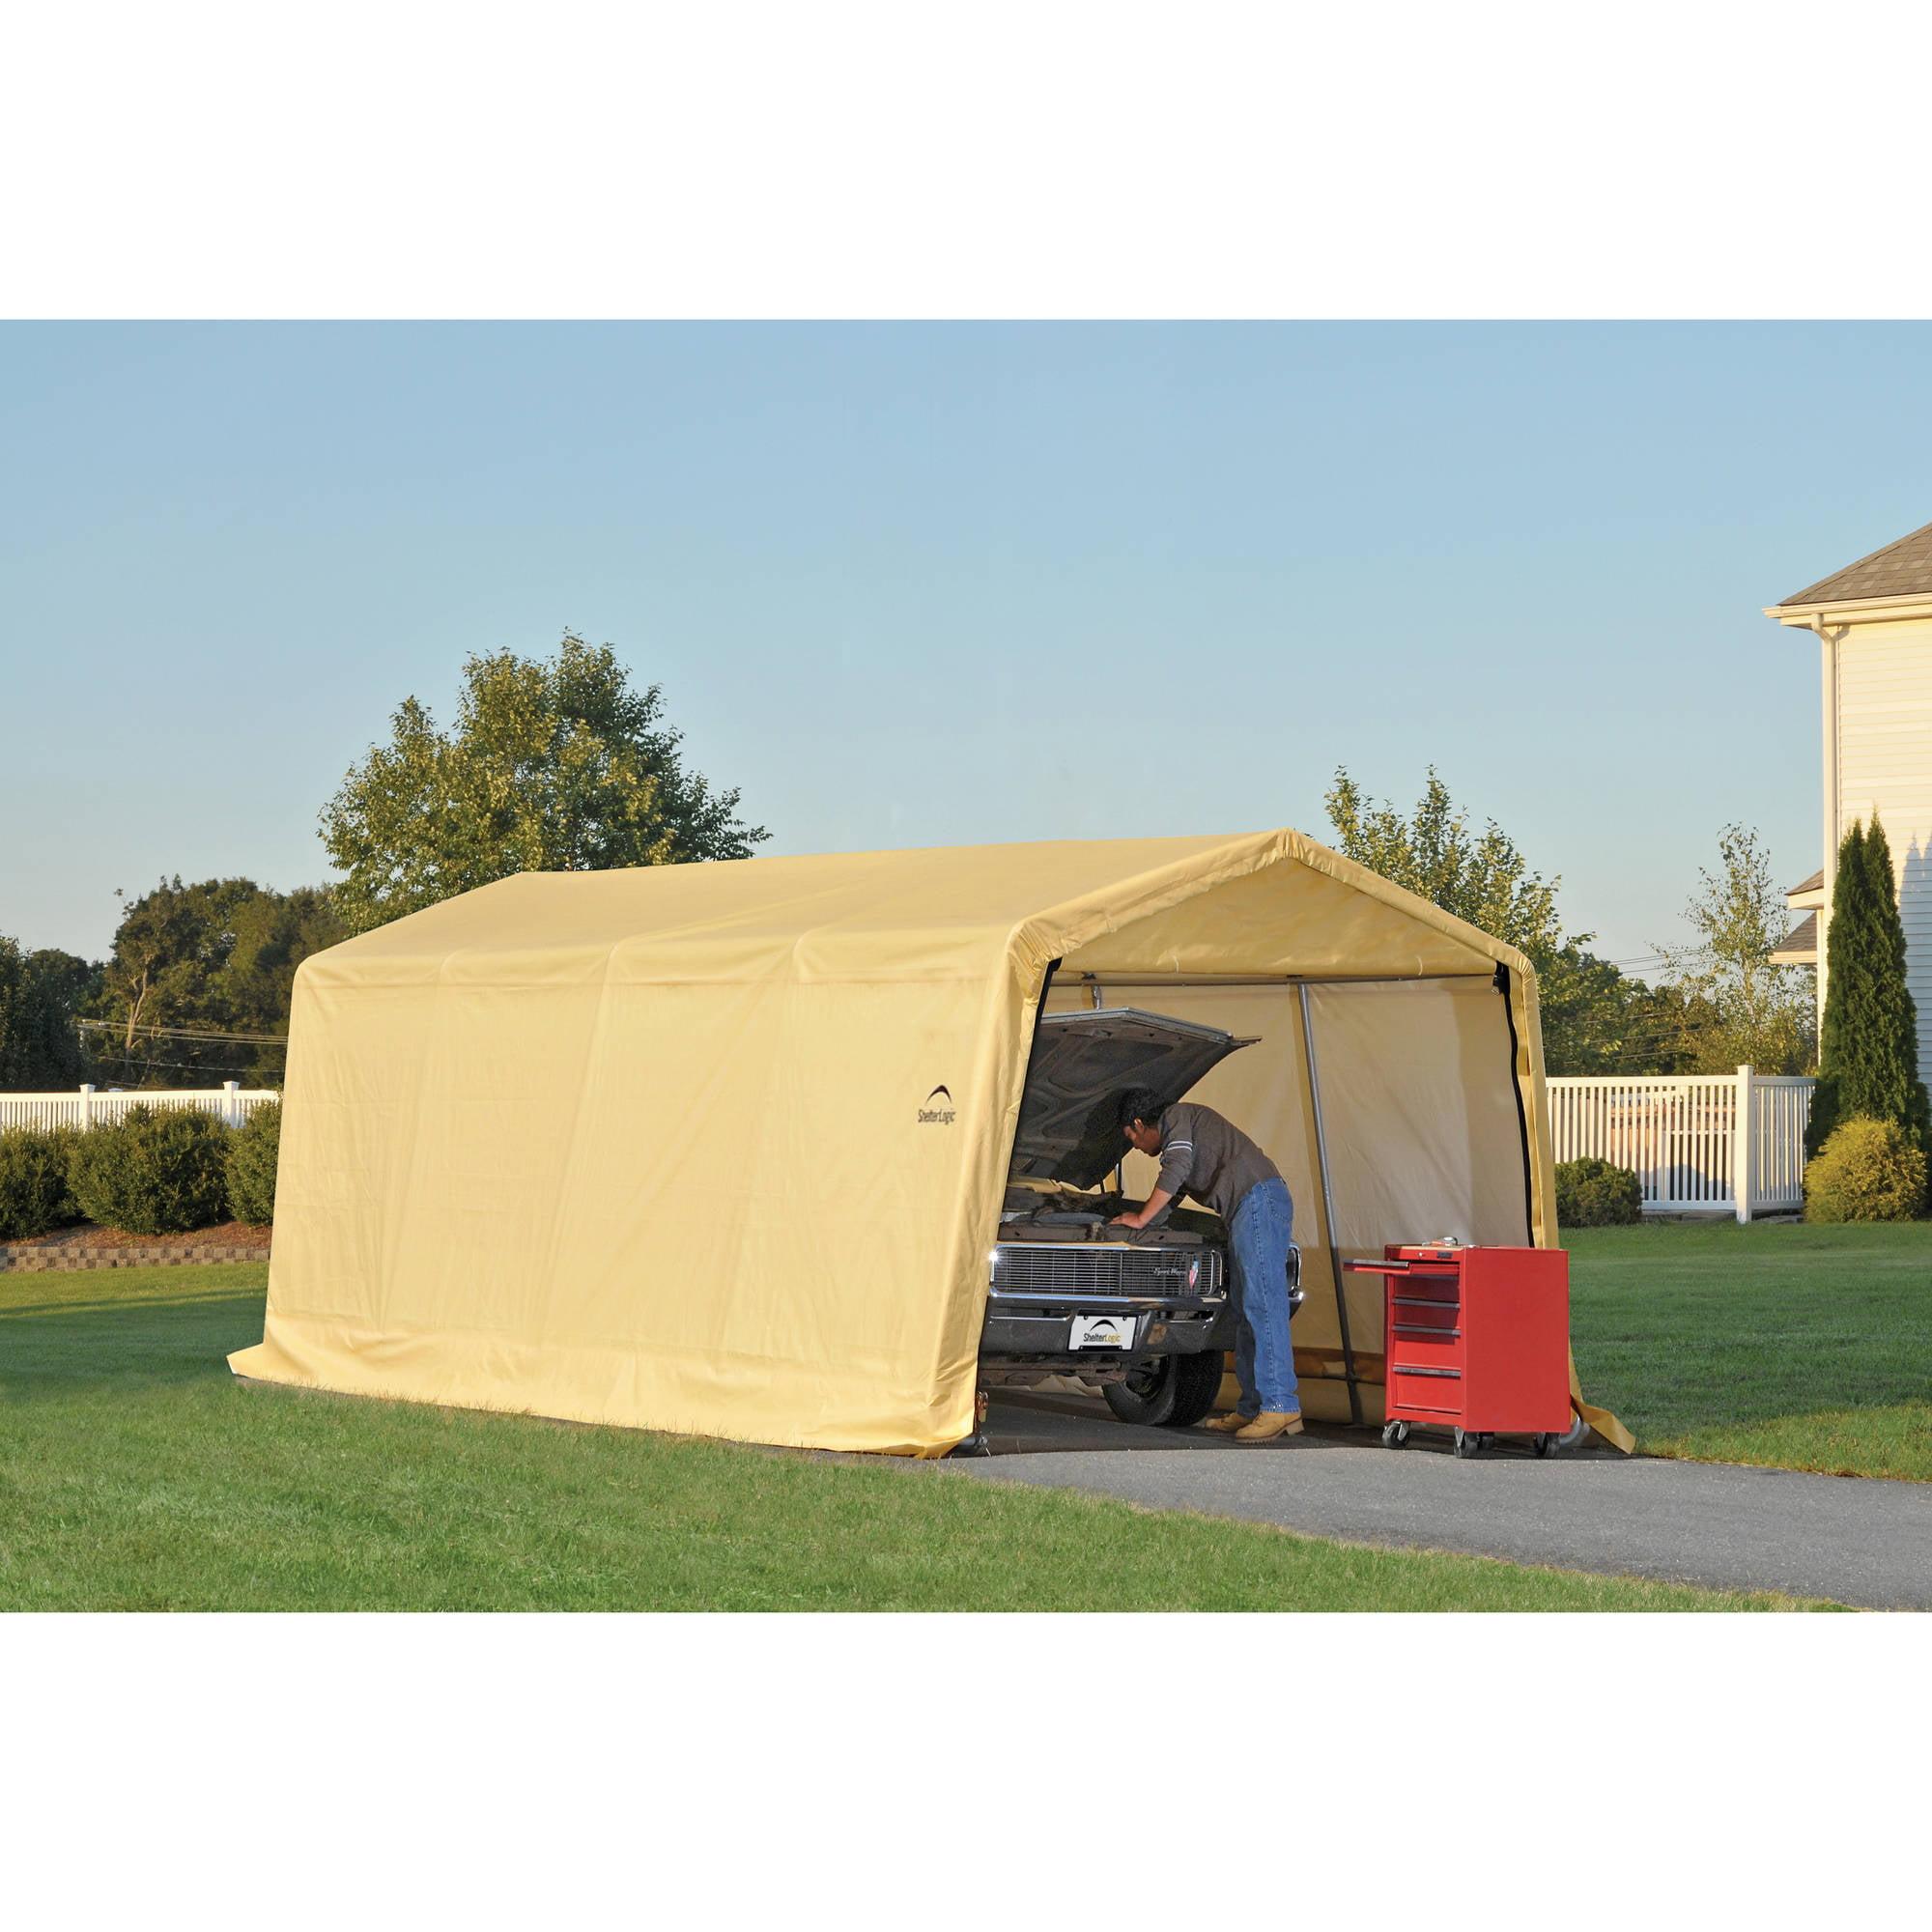 Auto Shelter 10' x 20 x8' Peak Style Instant Garage, Sandstone by Instant Garages